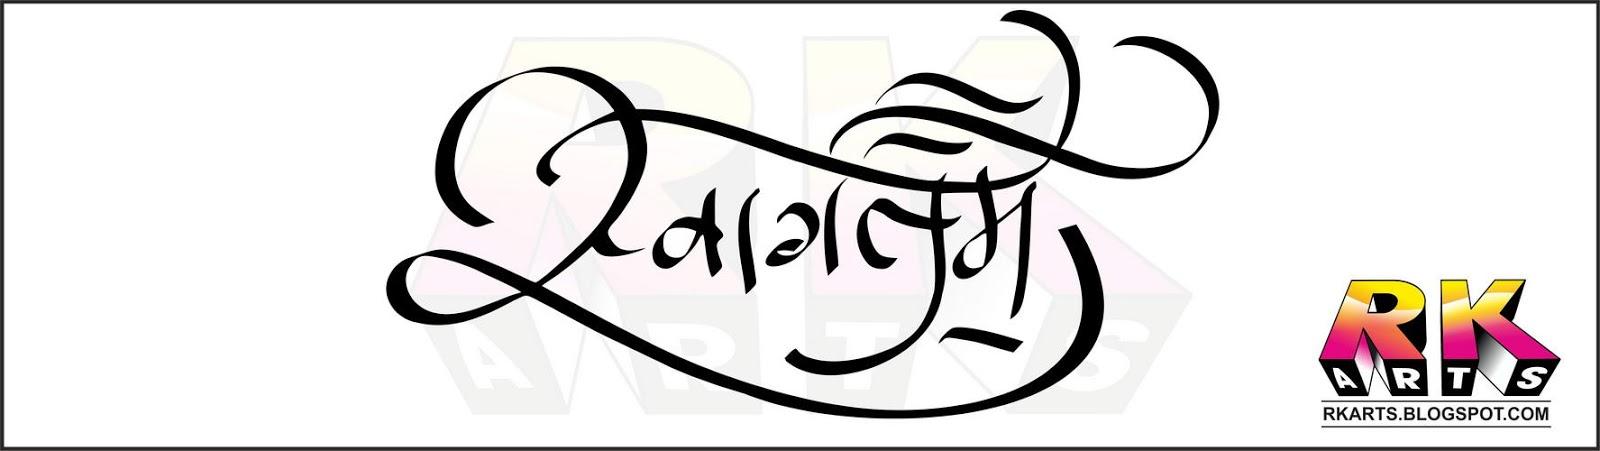 Hindi Calligraphy With Decorative Ornaments R K Arts